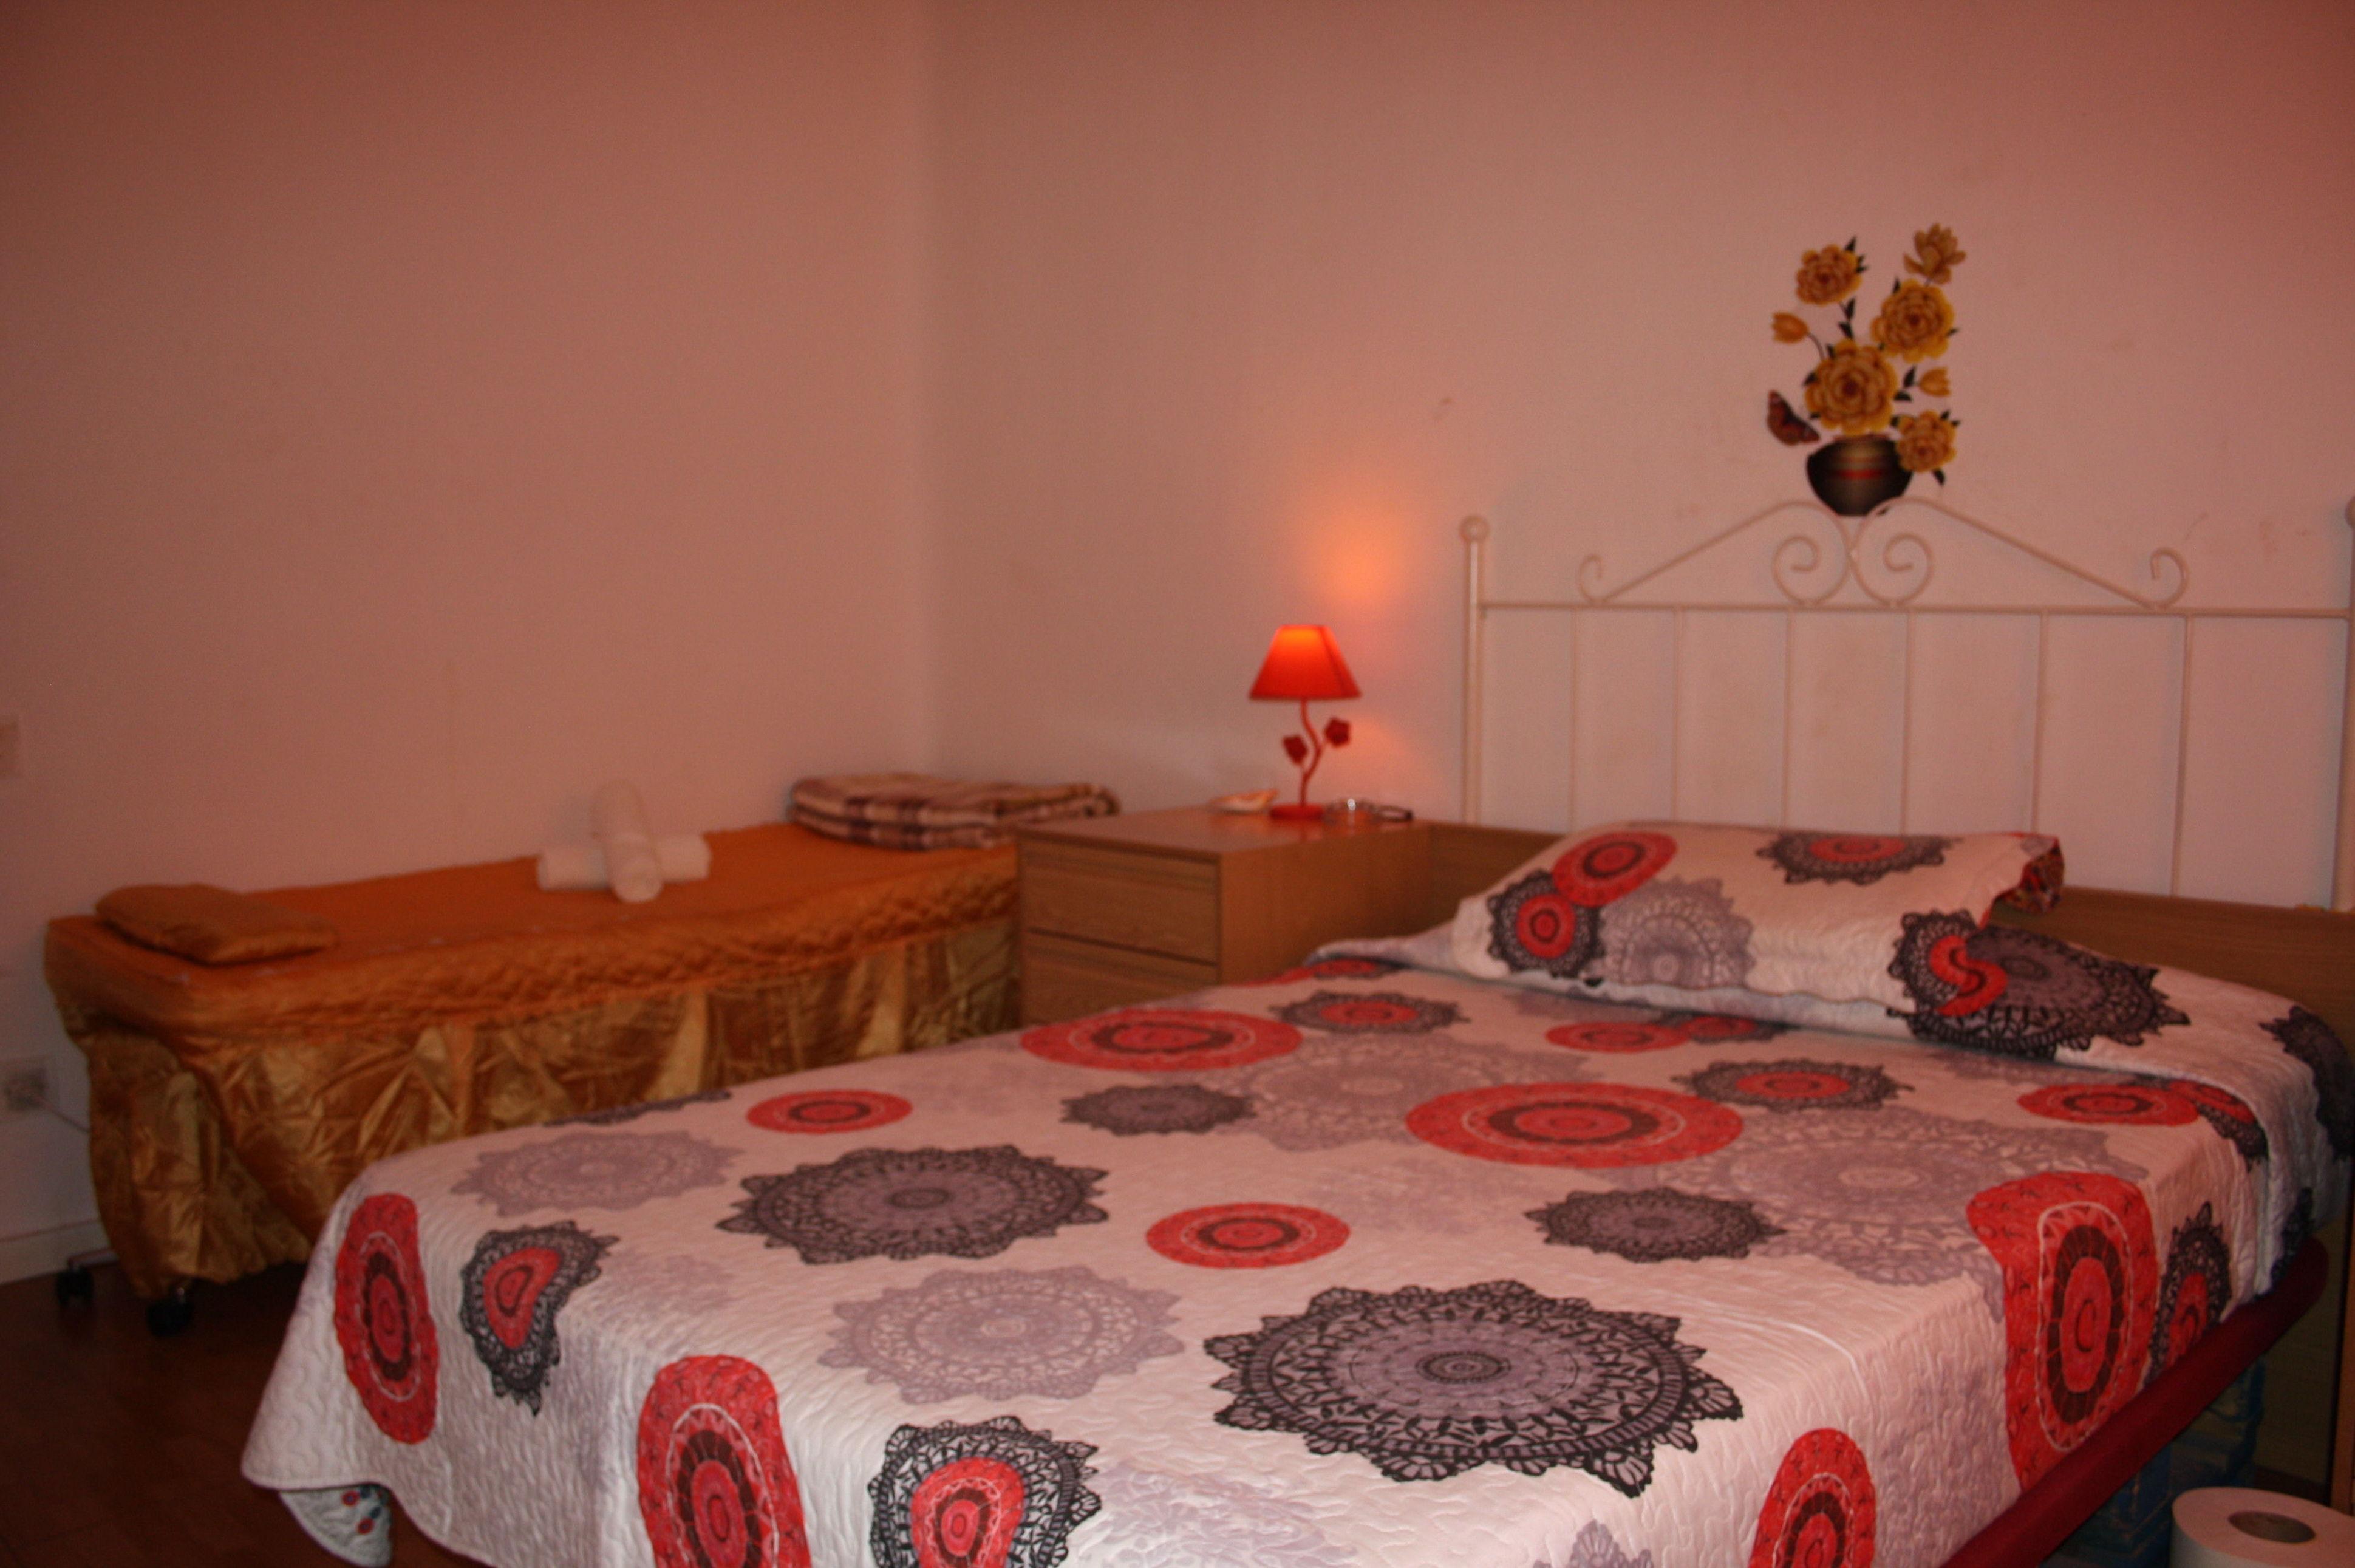 Foto 8 de Erotic massage en Madrid | Oriental Massage Madrid